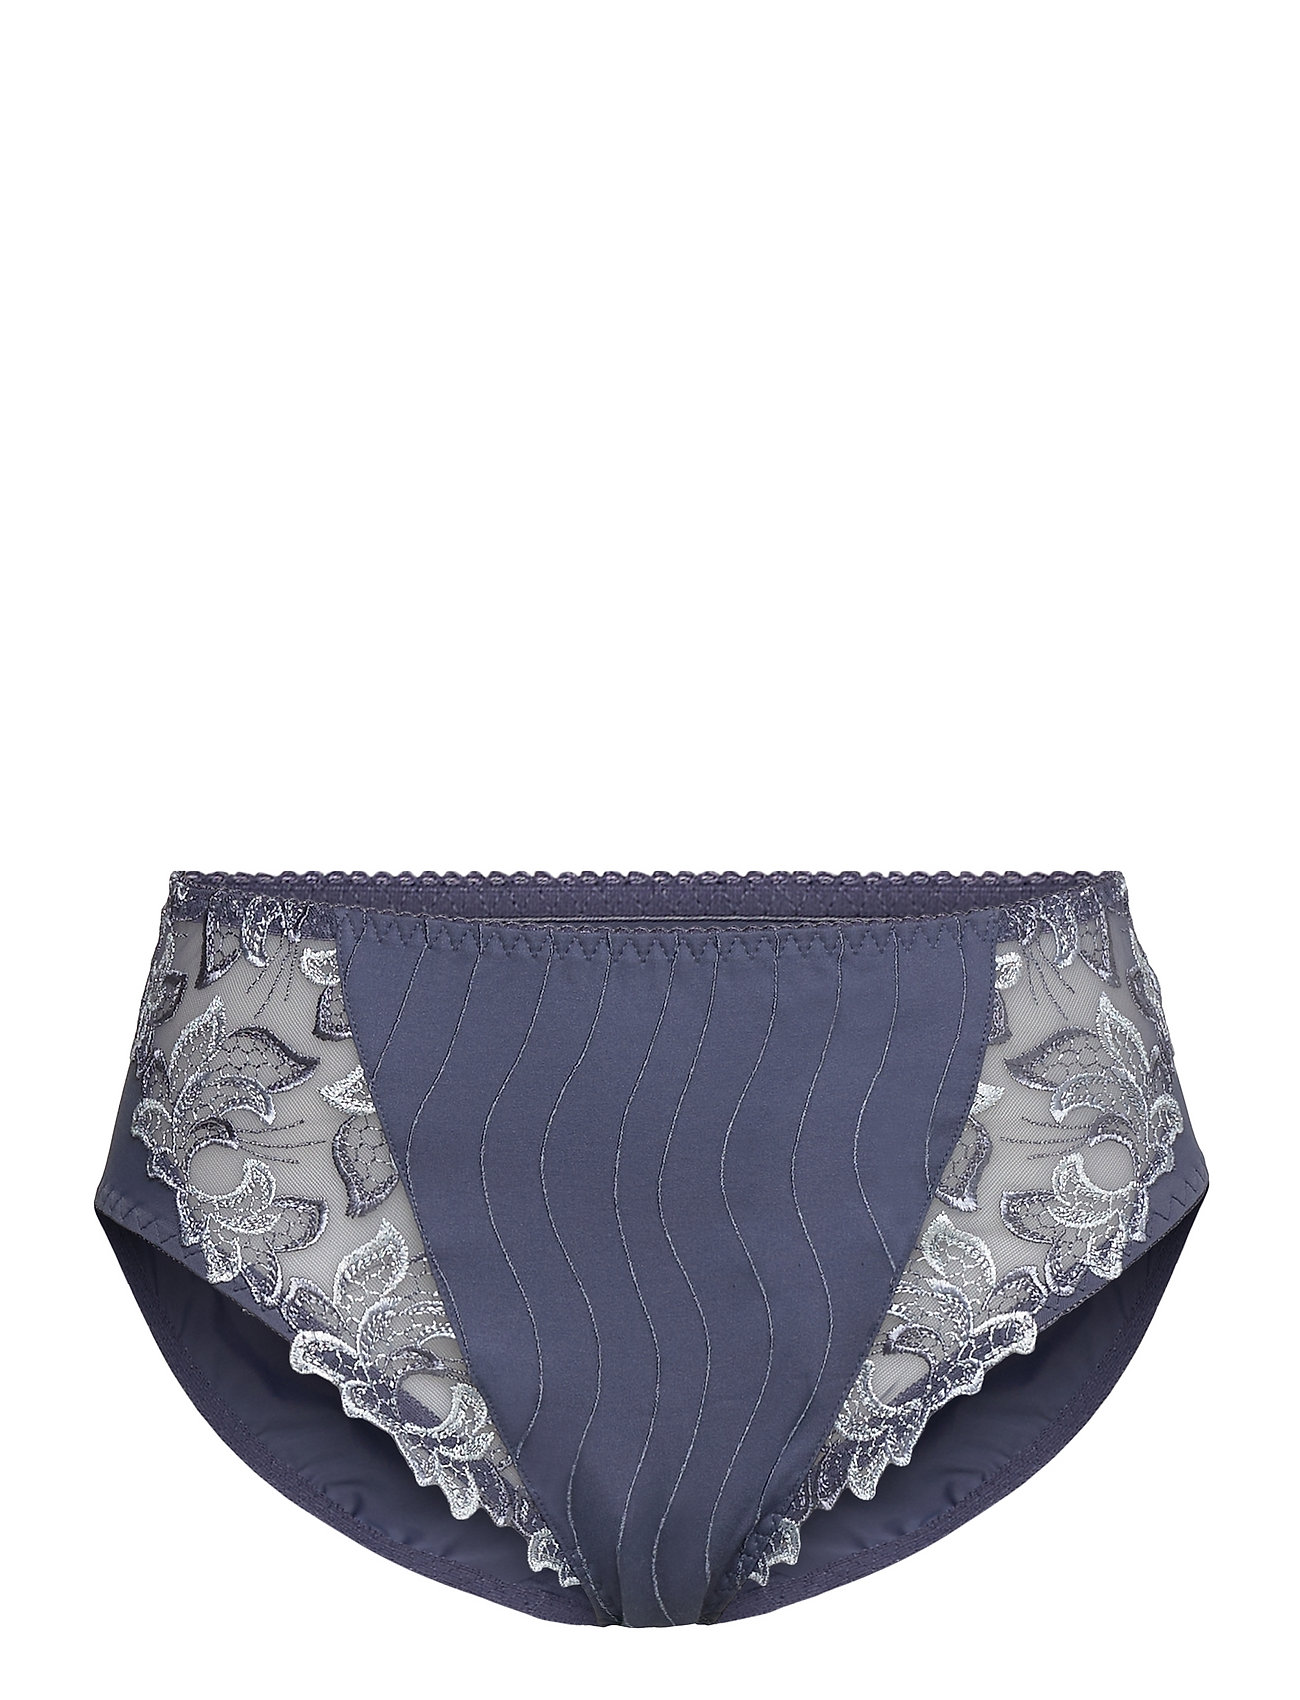 Deauville Lingerie Panties Hipsters/boyshorts Blå Primadonna